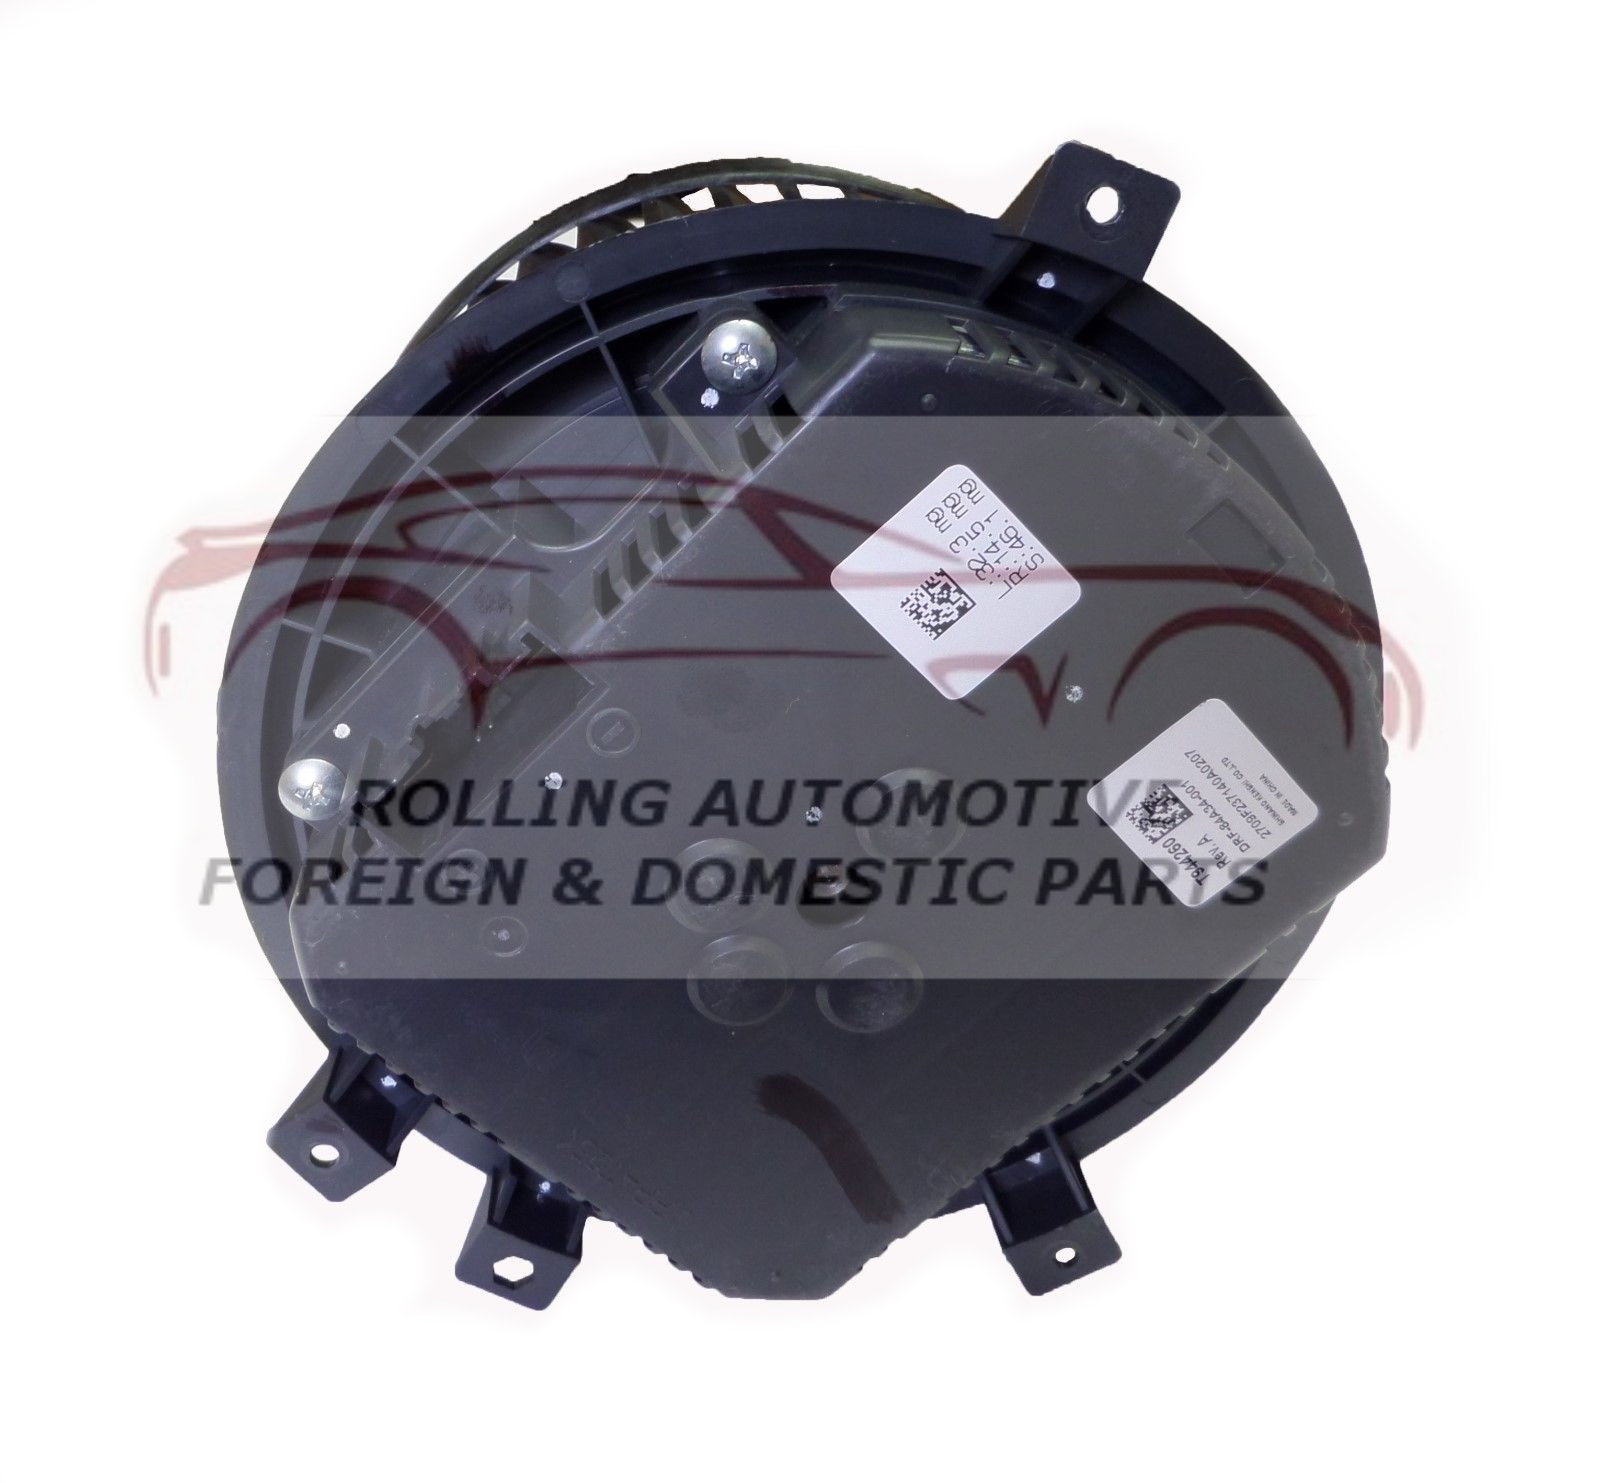 Hvac a c heater blower fan motor new 23150830 oem 23227183 for Furnace blower motor price